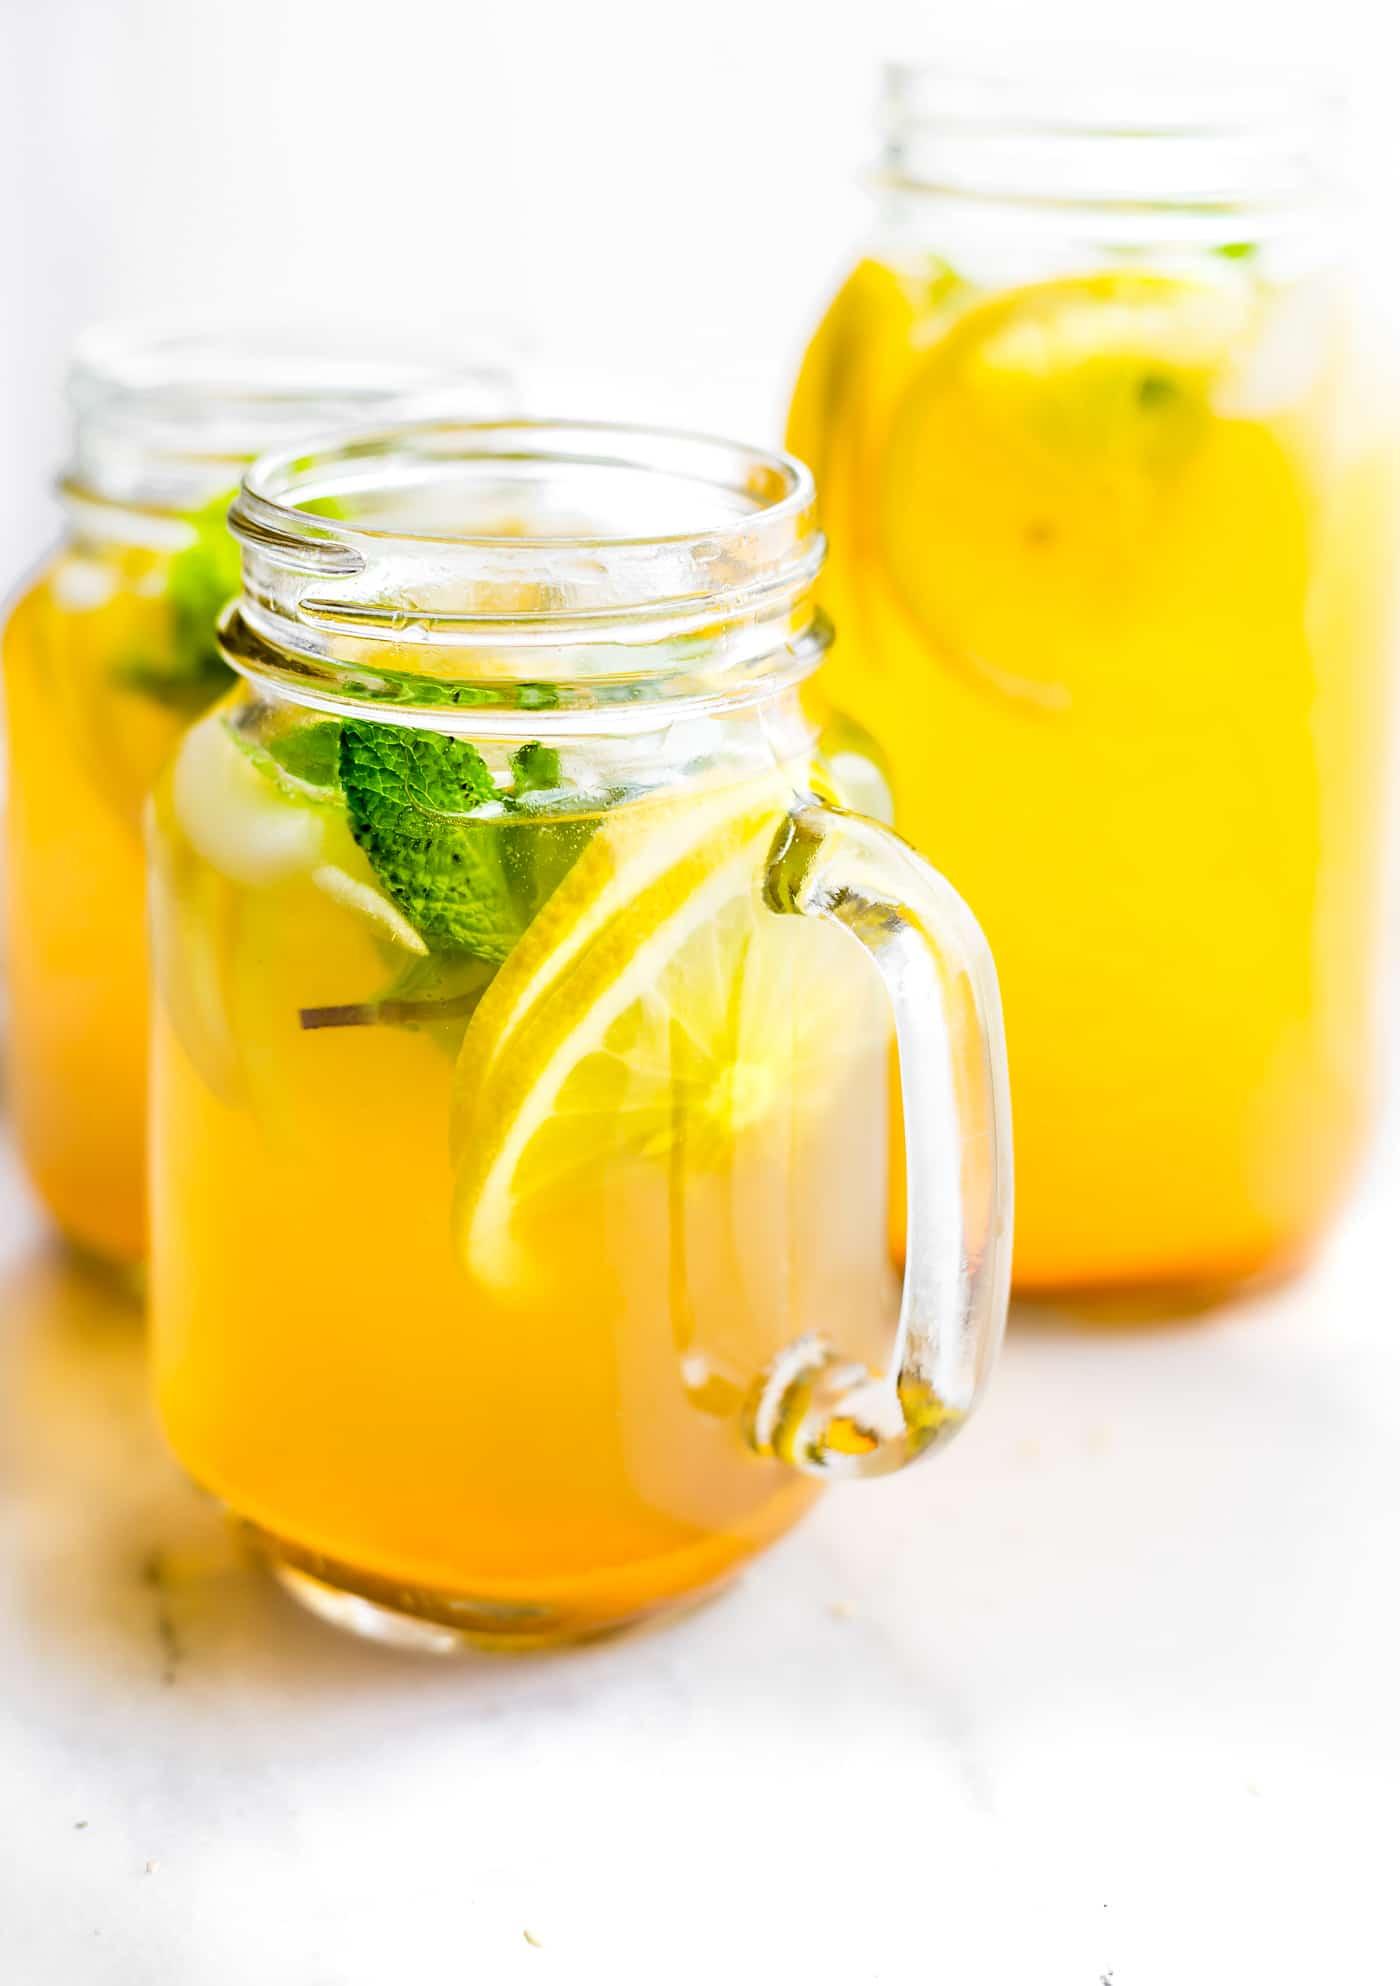 Turmeric Ginger Lemonade with Mint